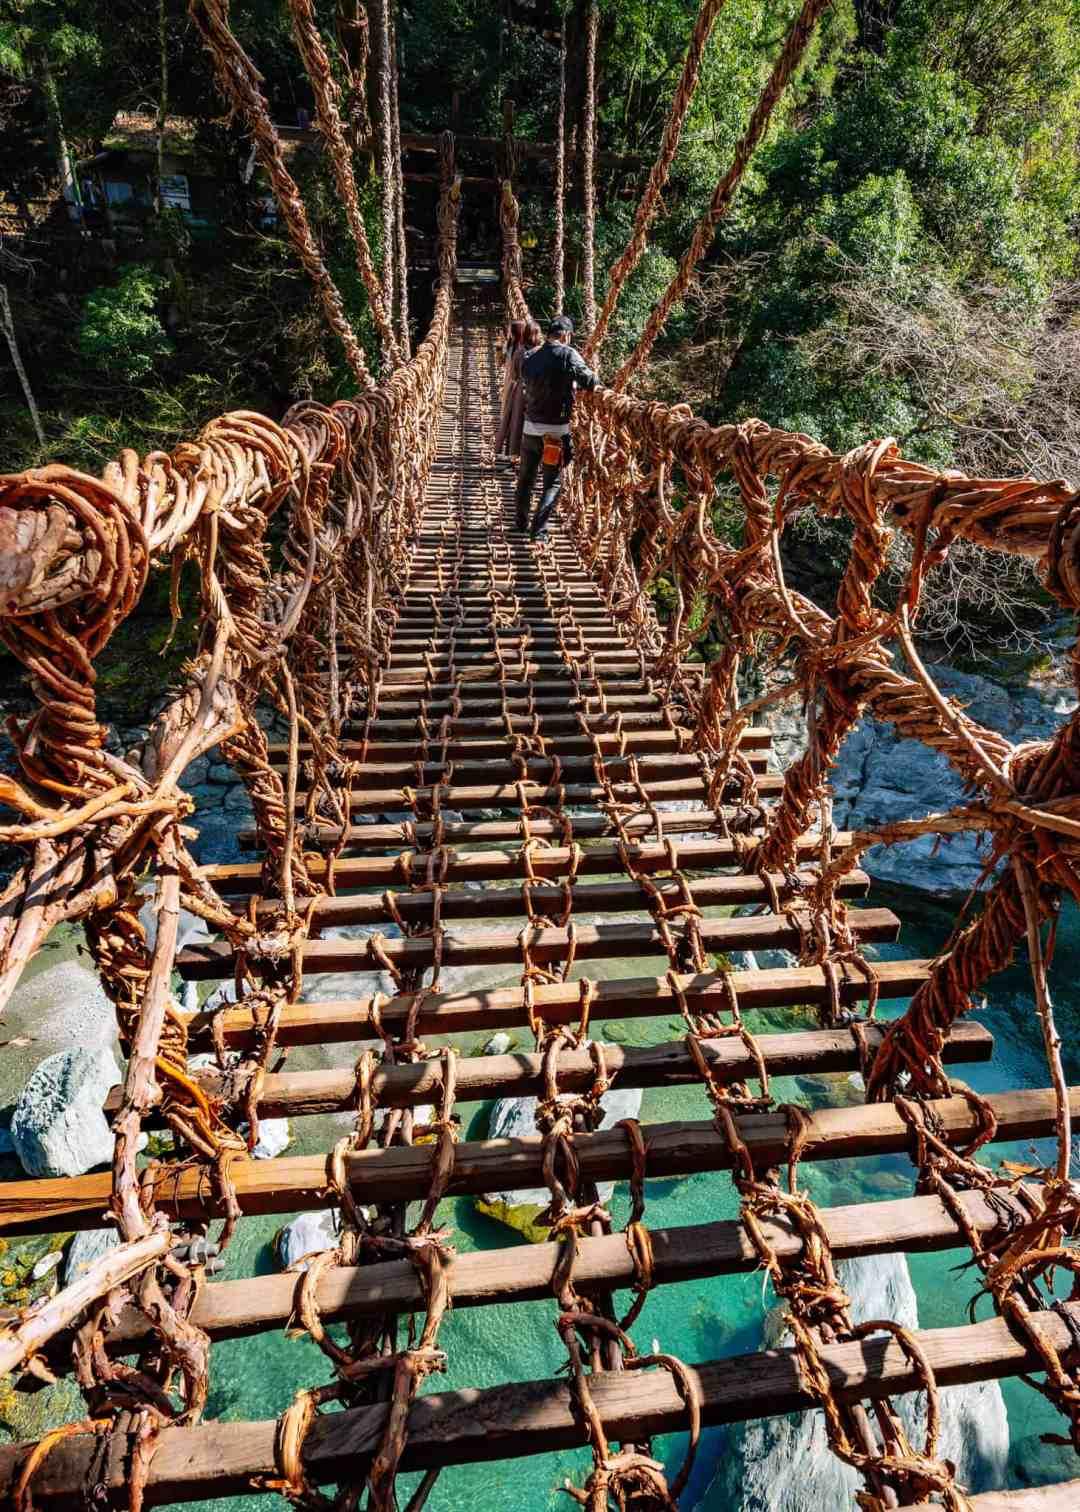 kazurabashi vine suspension bridge in tokushima prefecture japan